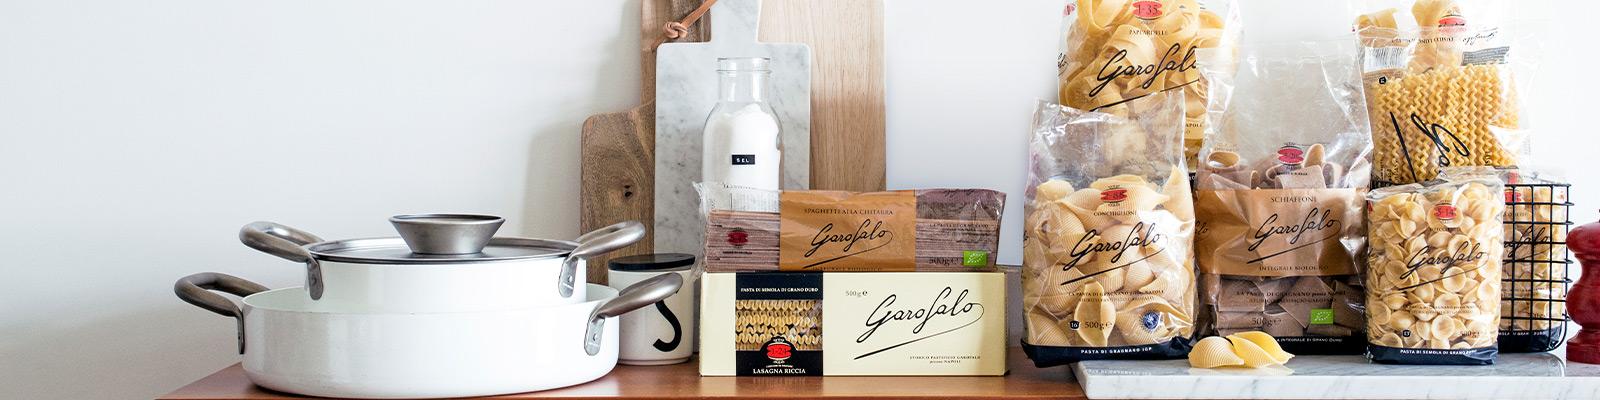 Pasta Garofalo - Formati Speciali